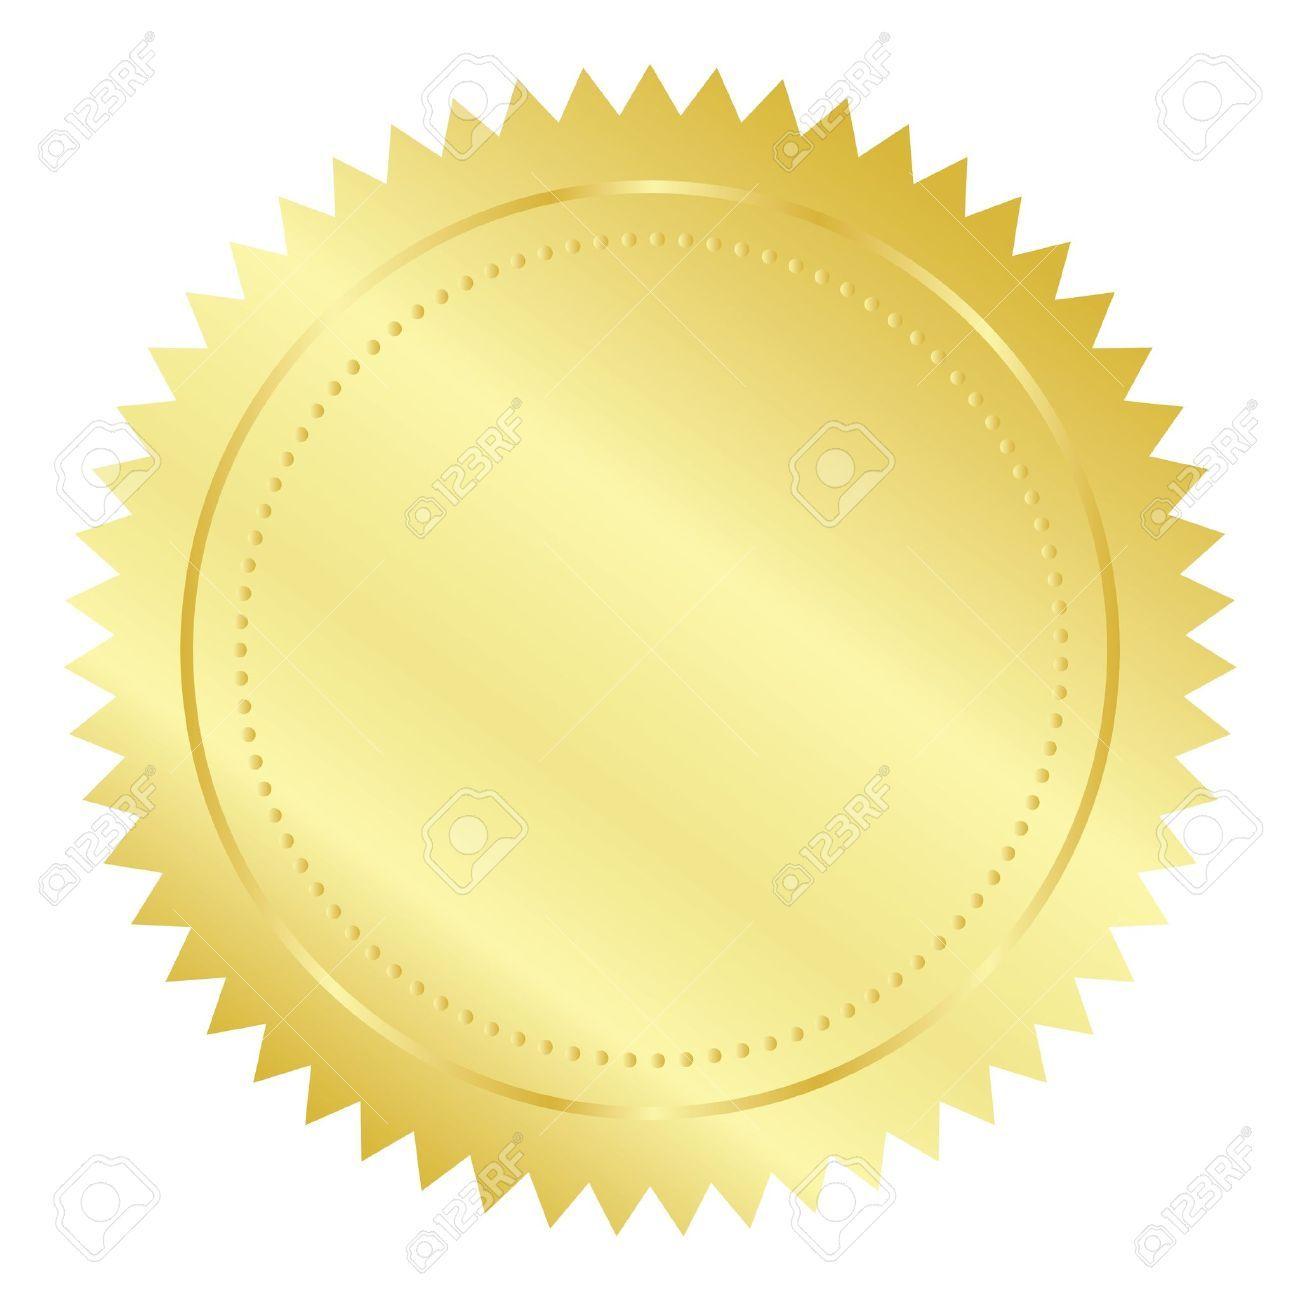 Award seal clipart 4 » Clipart Portal.